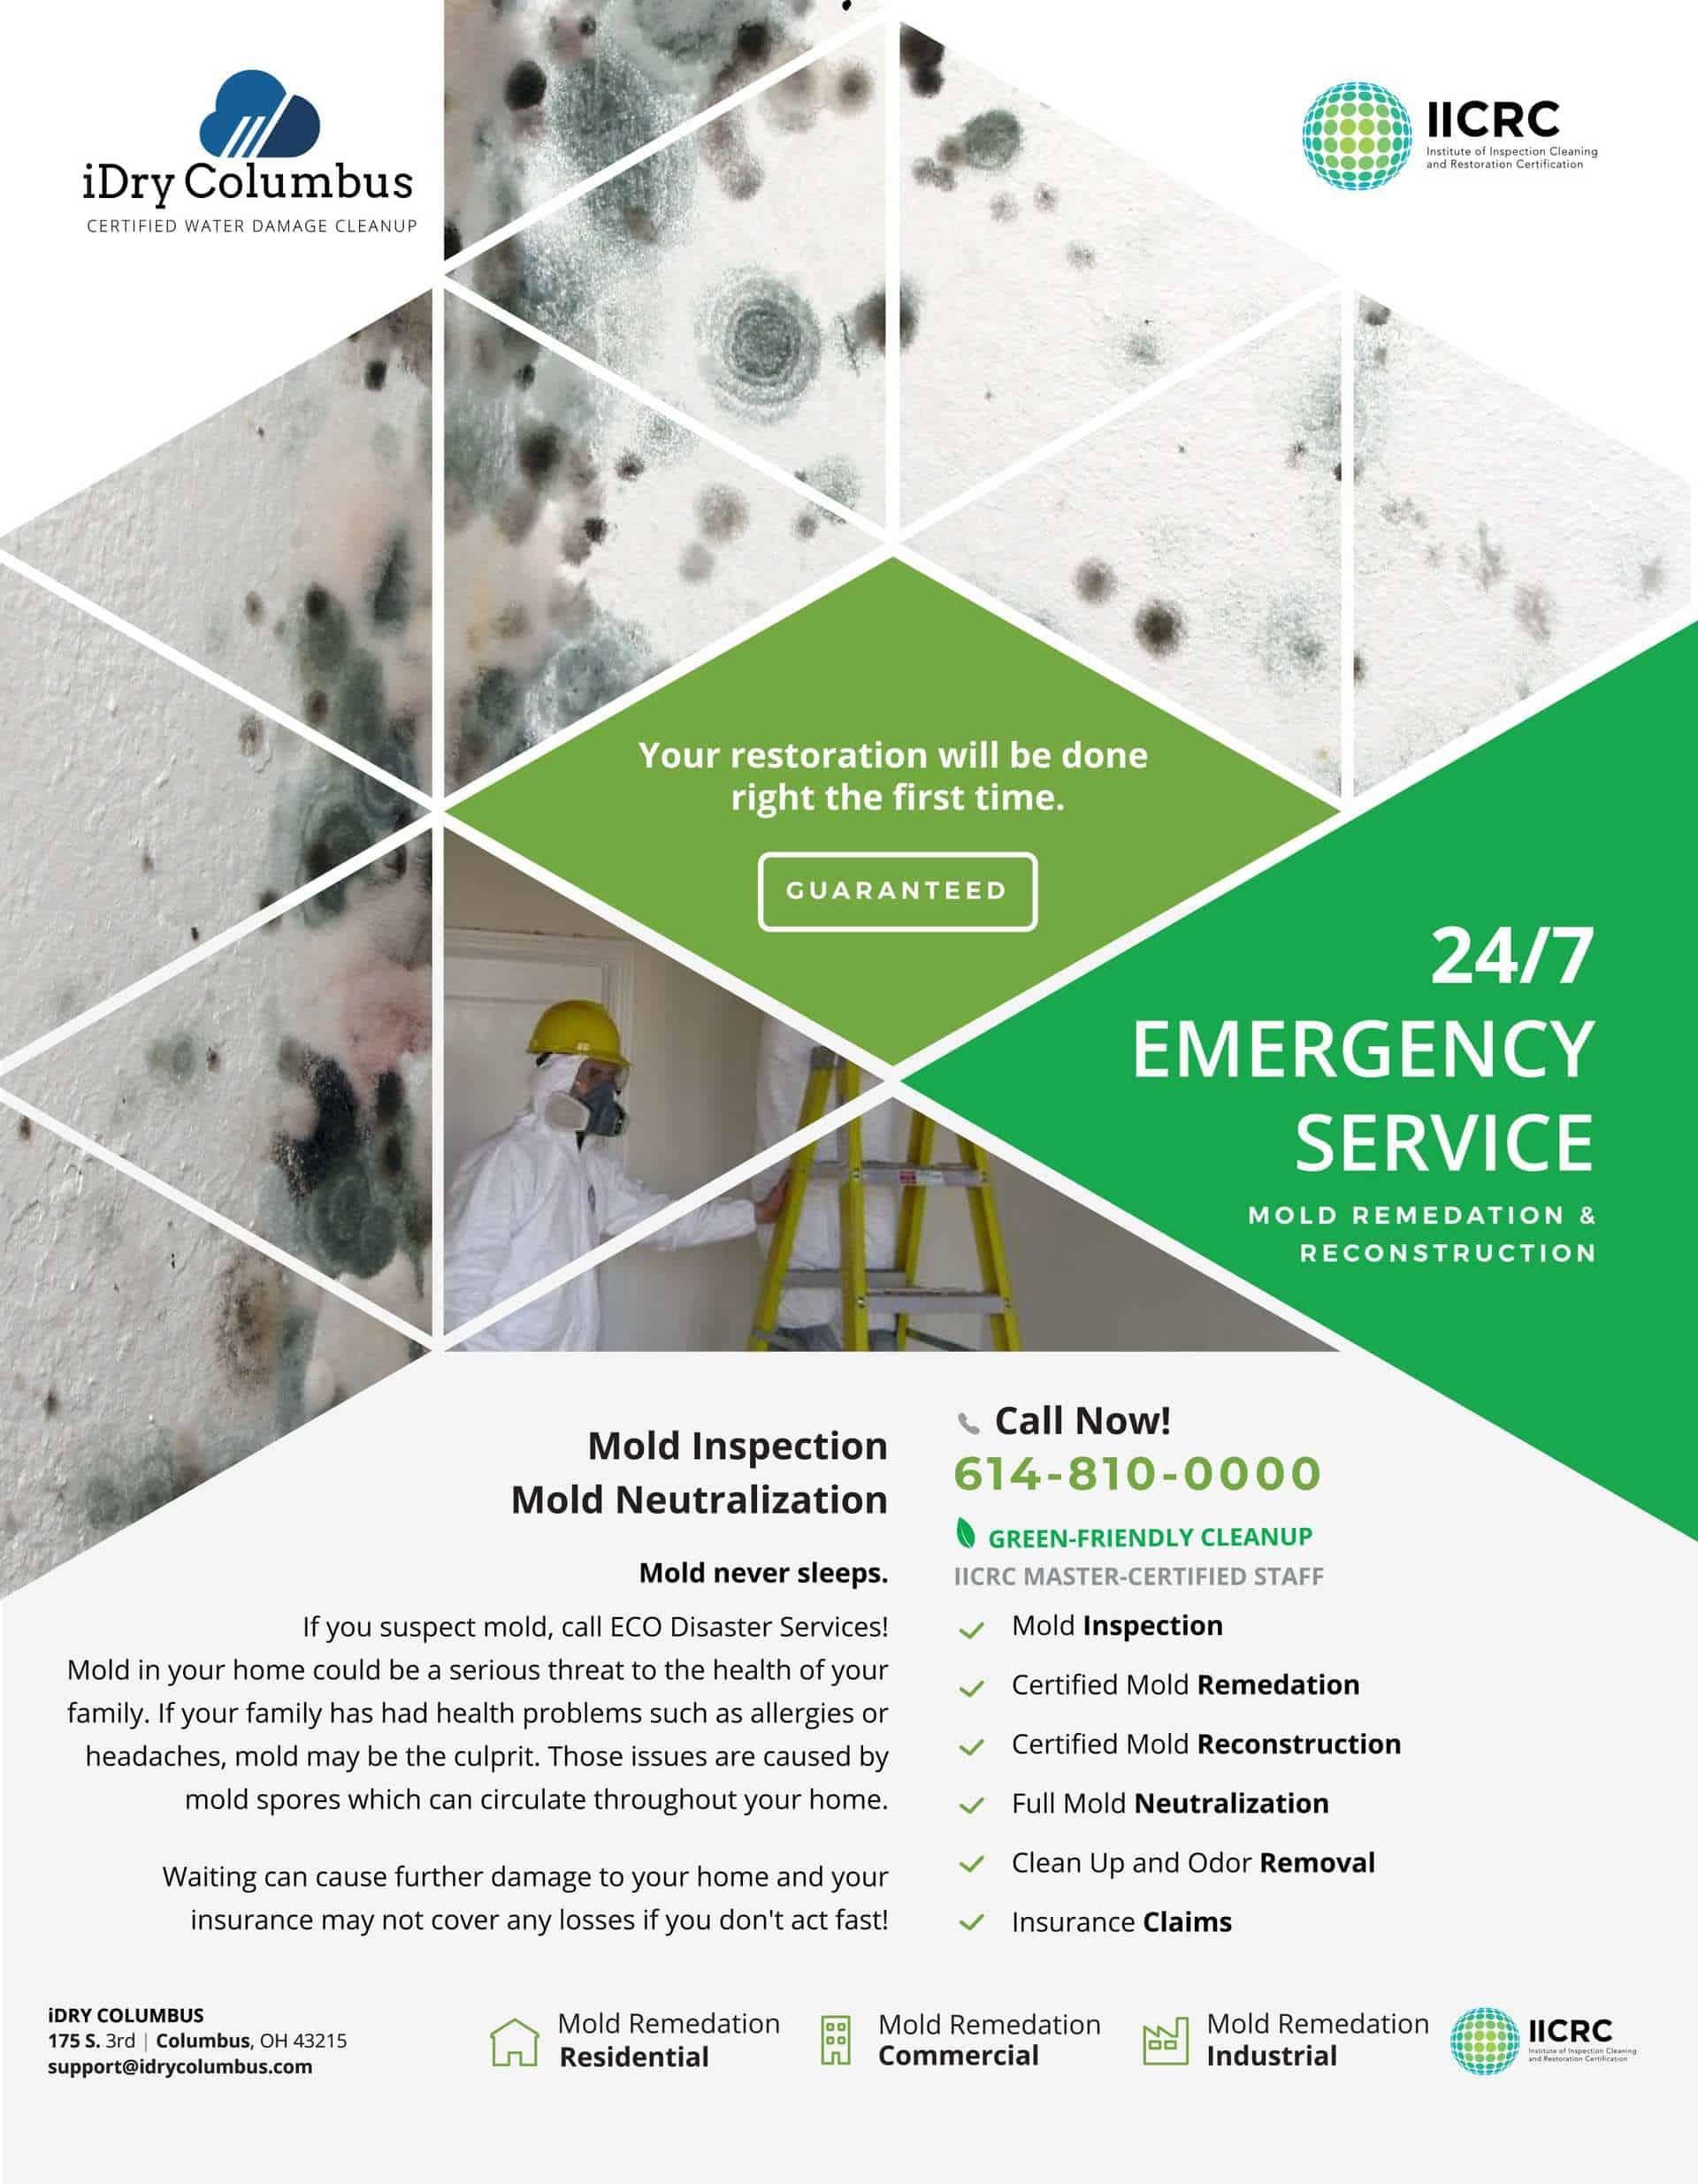 Blacklick Water Damage & Mold Remediation • IDry Columbus